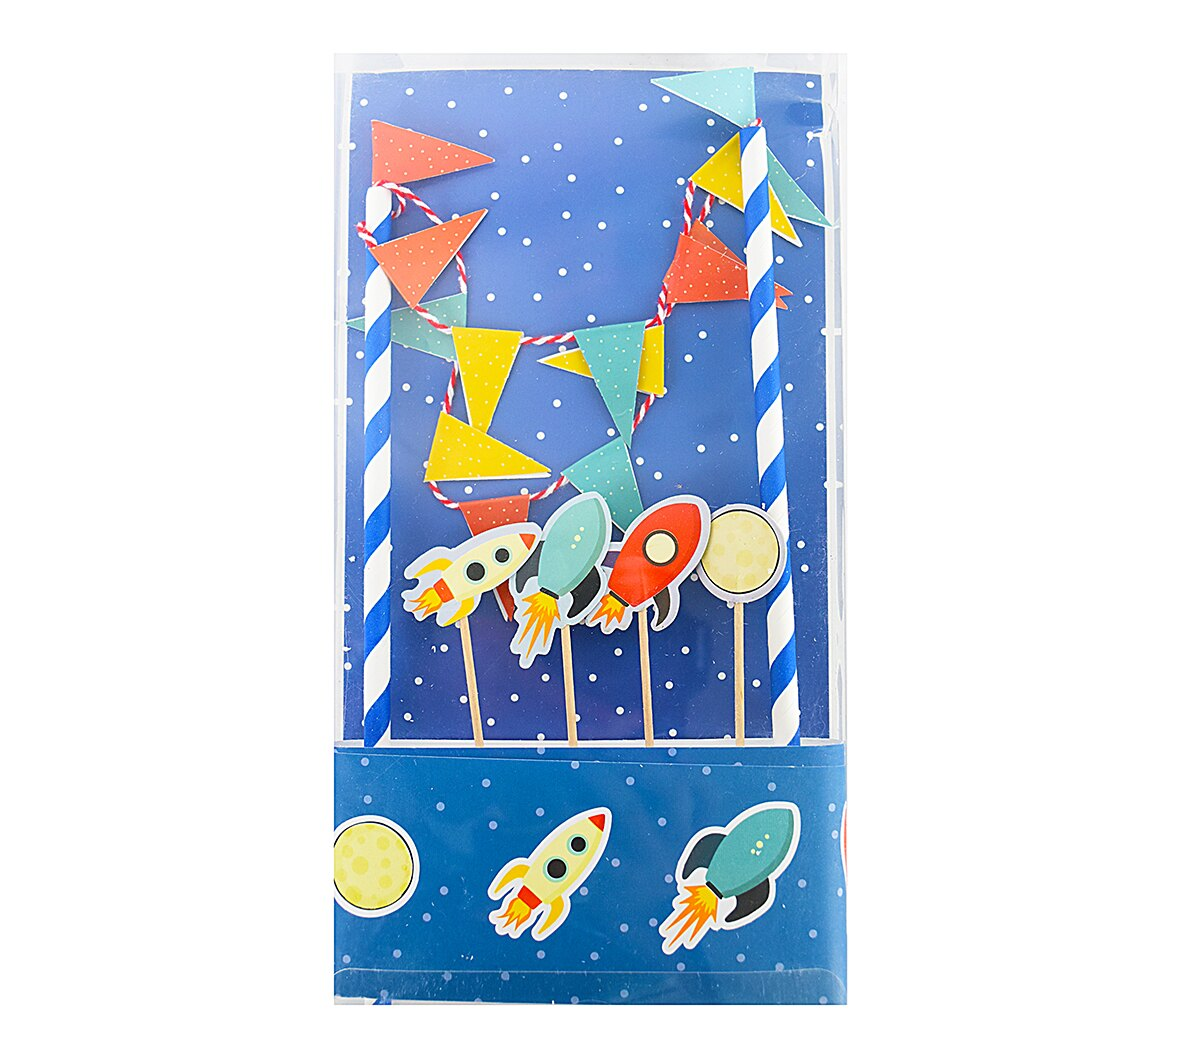 X射線【Y030001】生日蛋糕插旗組-火箭,拉旗/慶生/婚禮佈置/會場佈置/生日派對/園遊會/party